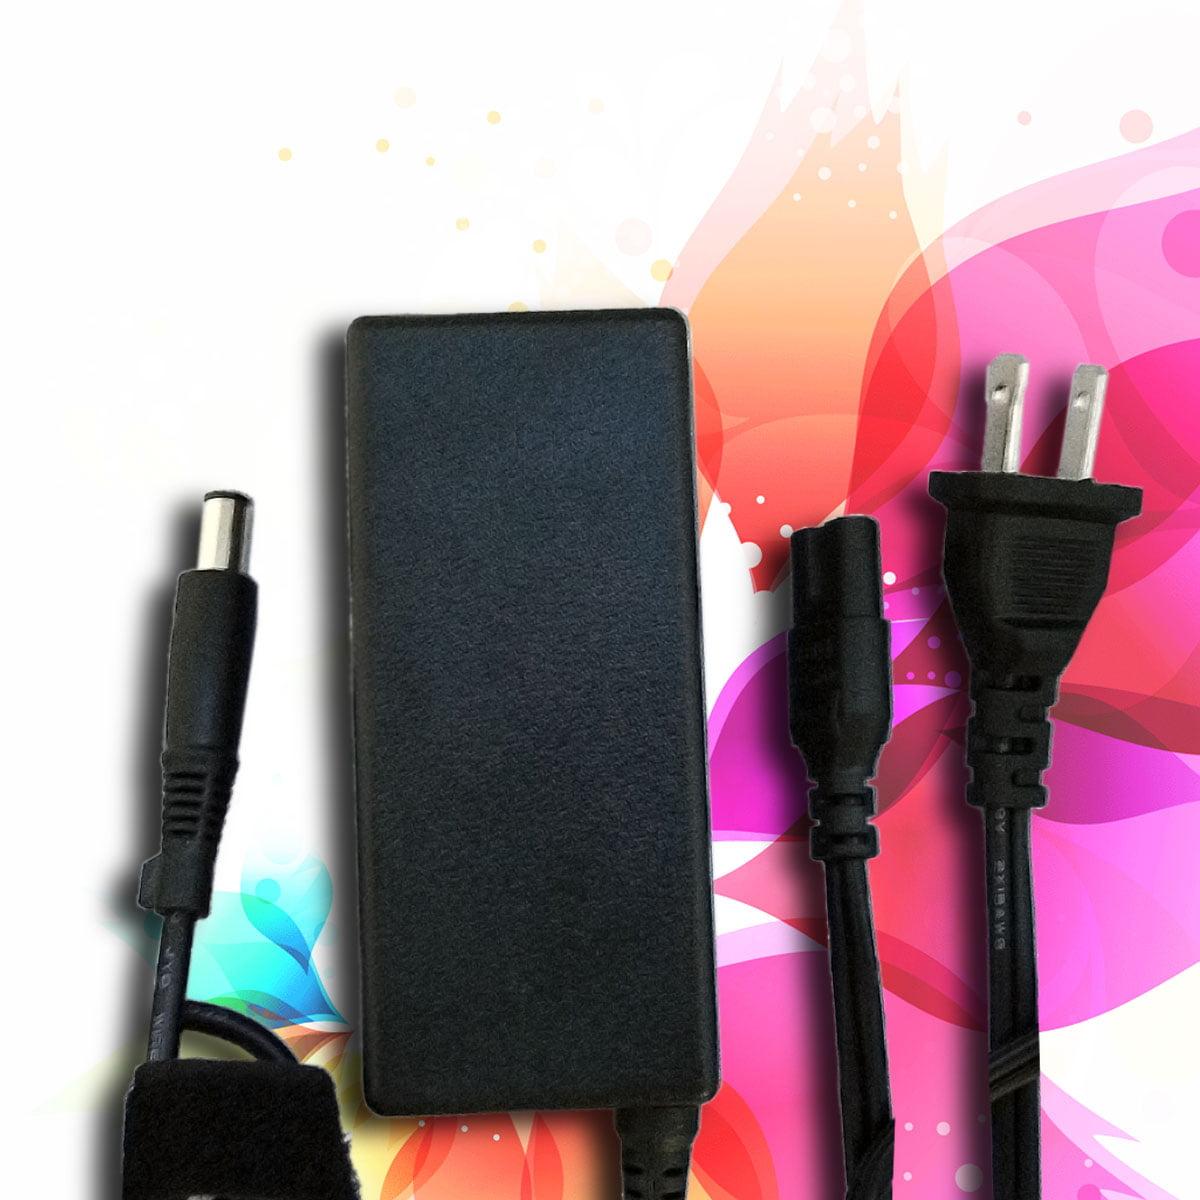 New AC power Adapter for HP Compaq 6510b 6515b 6530b 6710b 6715b nx7300 nx7400